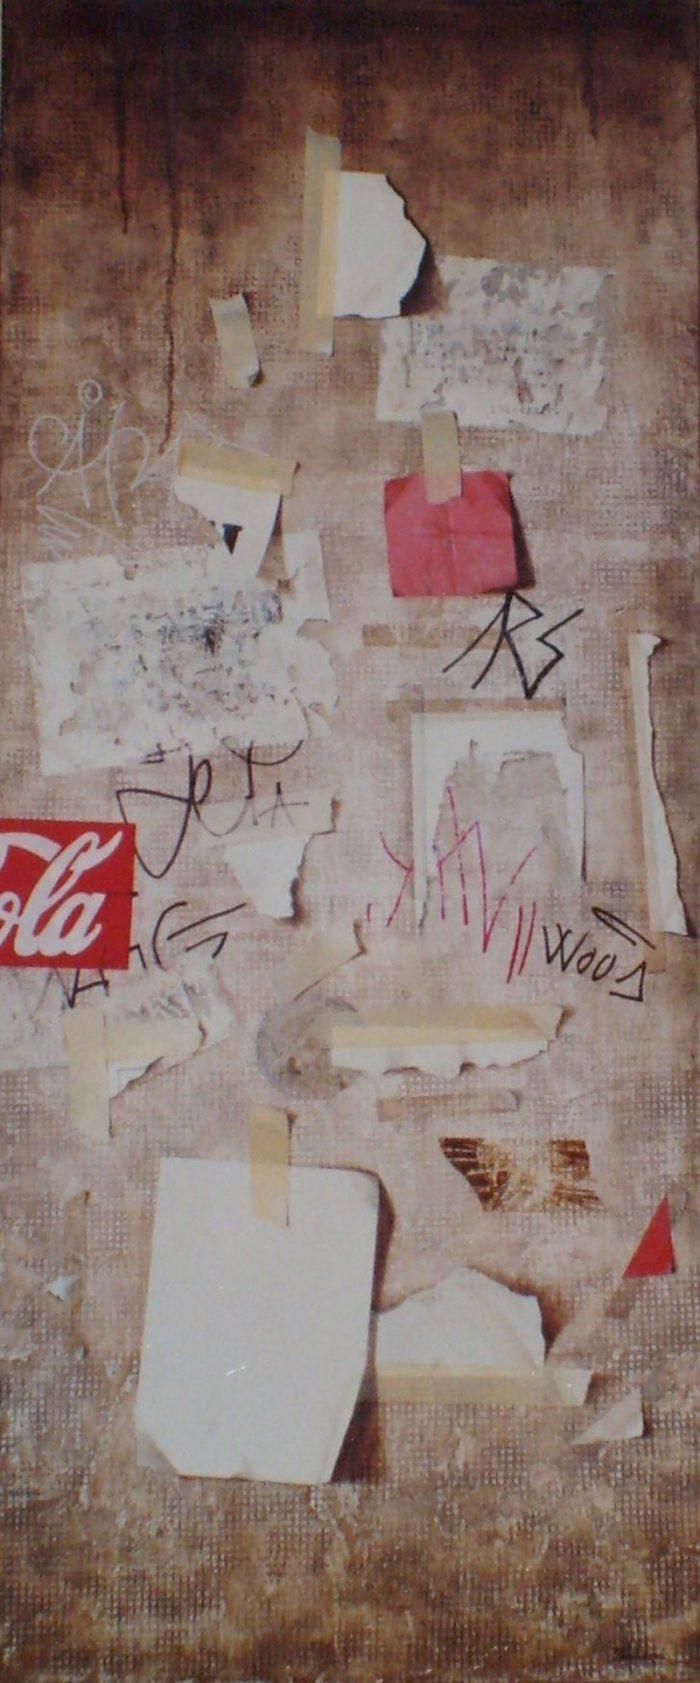 Sotoportego del pirieta, 2006, olio su tela, cm. 50 x 120